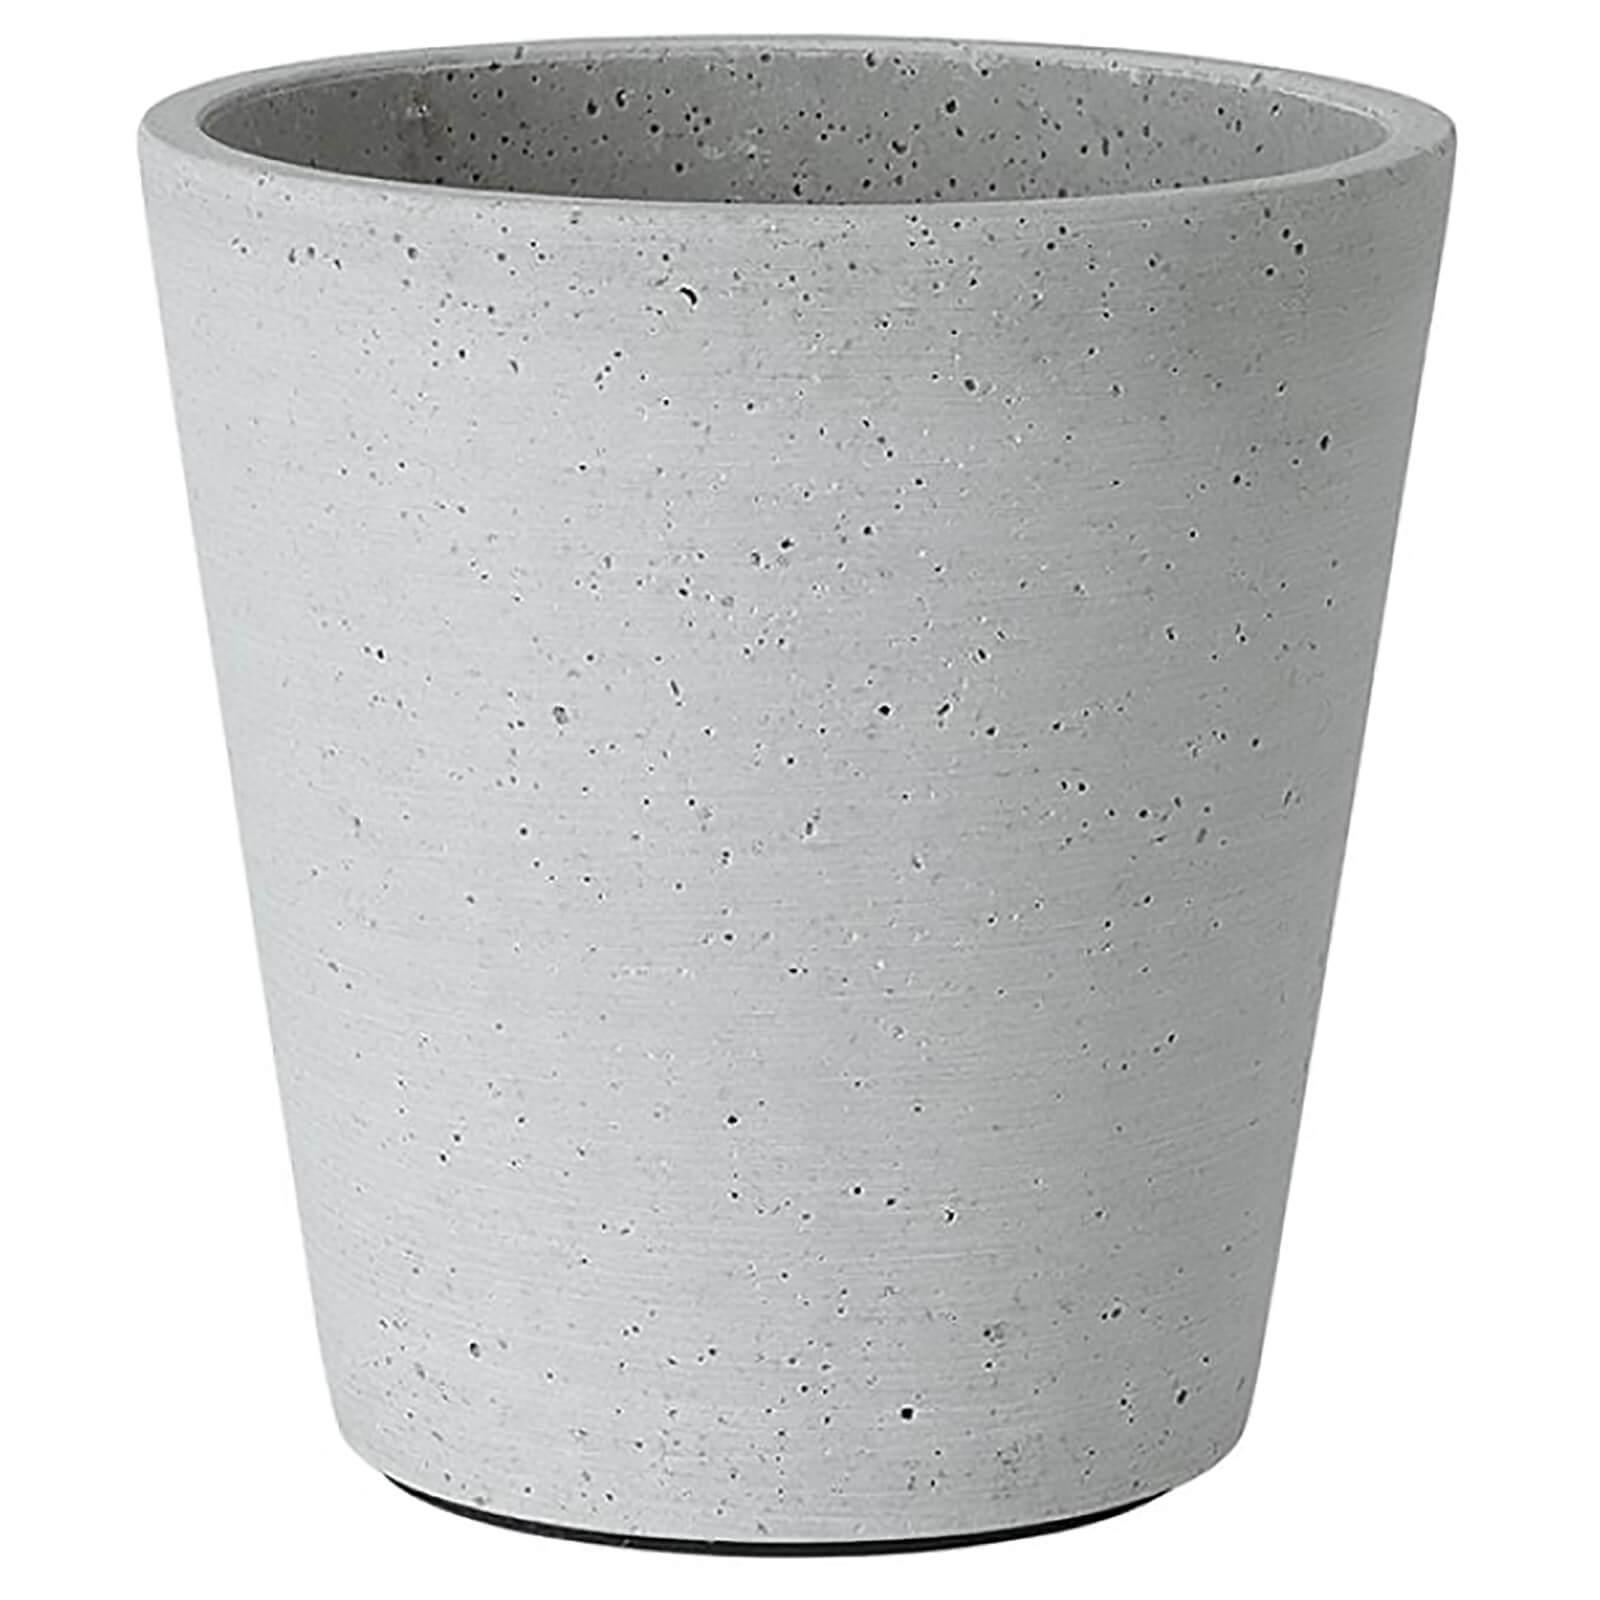 Blomus Coluna Flower Pot - Grey 14.5cm x 14cm